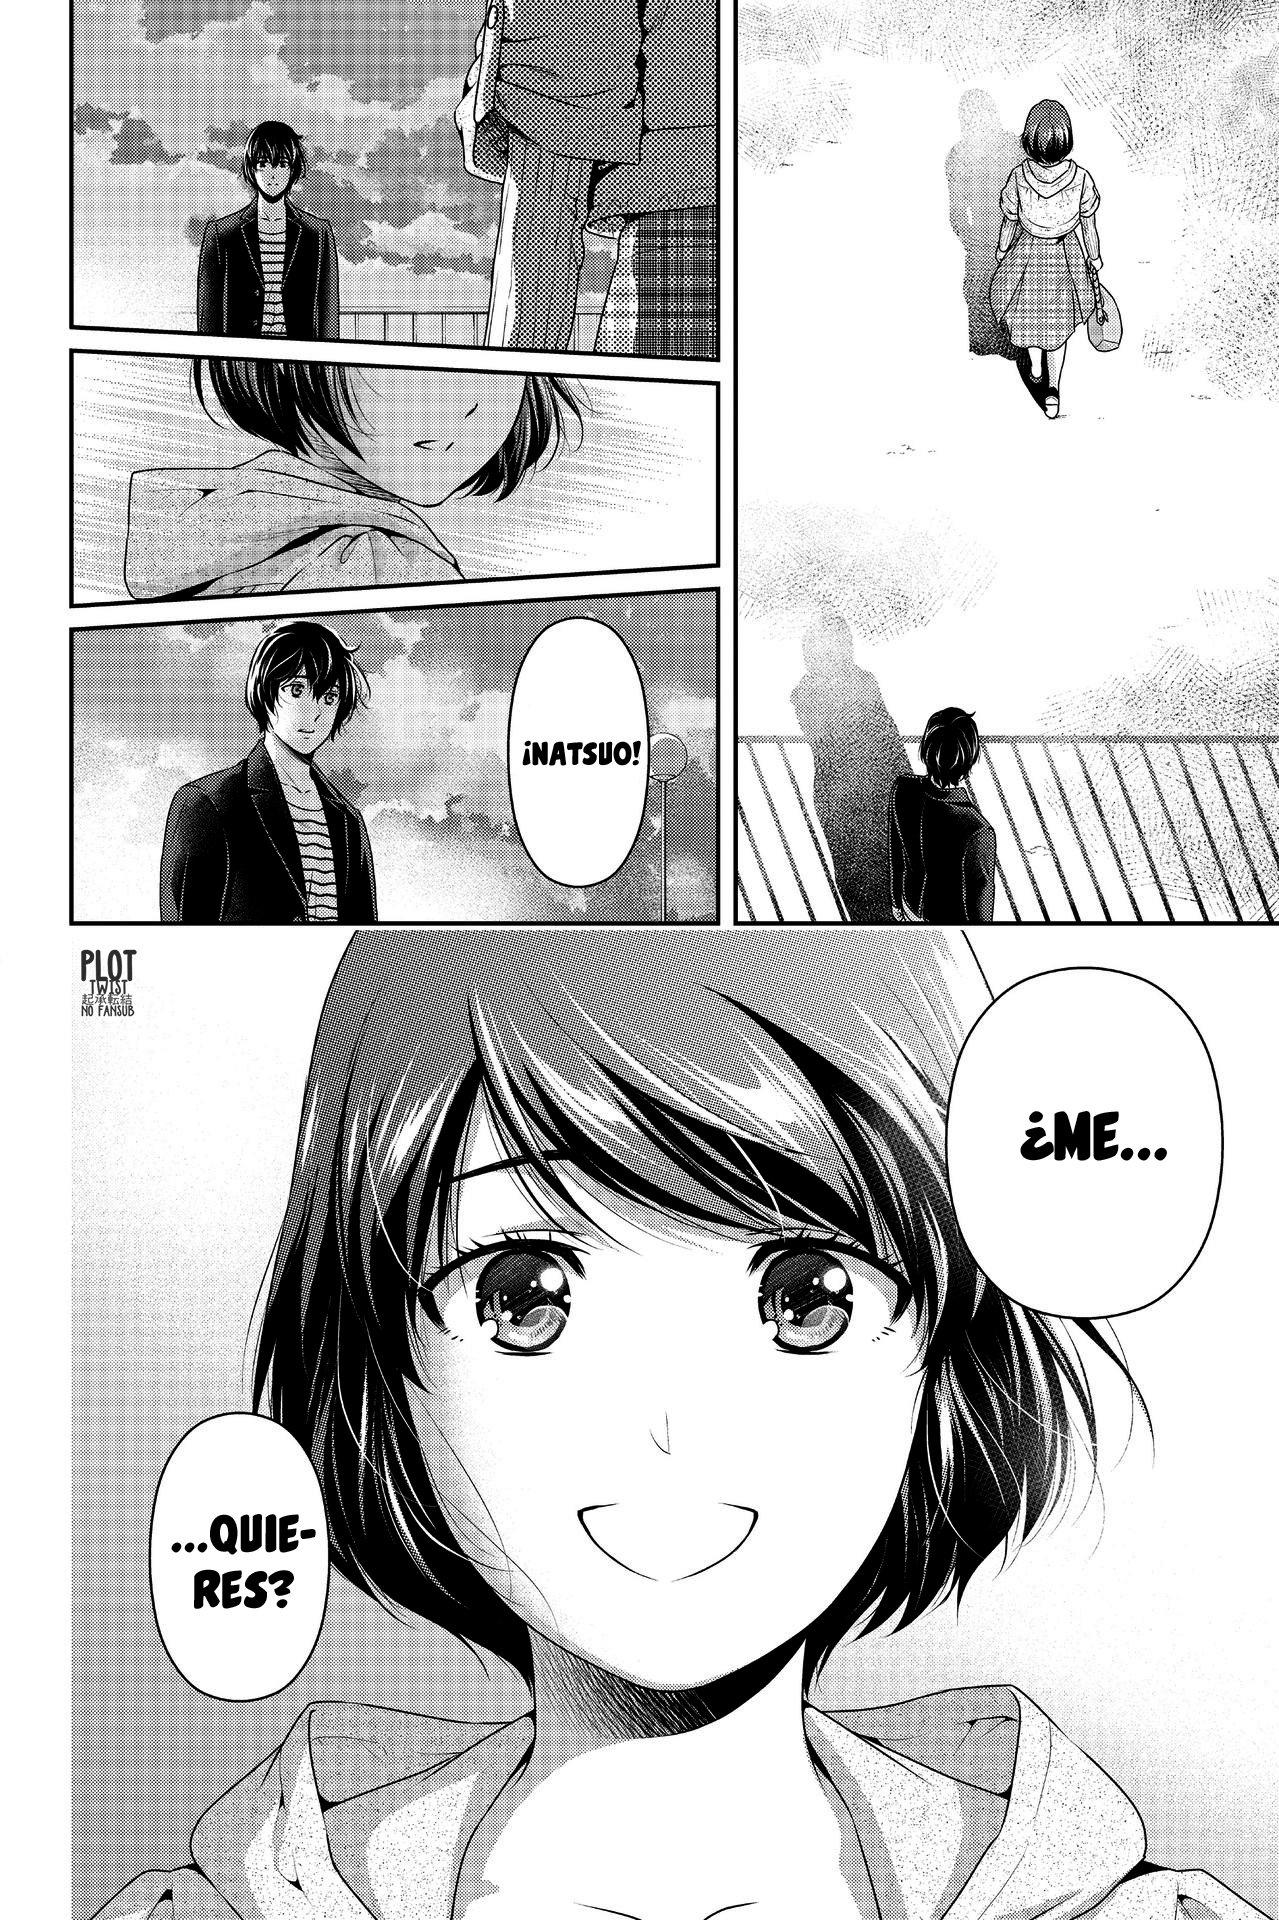 https://nine.mangadogs.com/es_manga/pic8/9/14345/945183/f0575a37298c1076e89060d3b3f5ec38.jpg Page 14